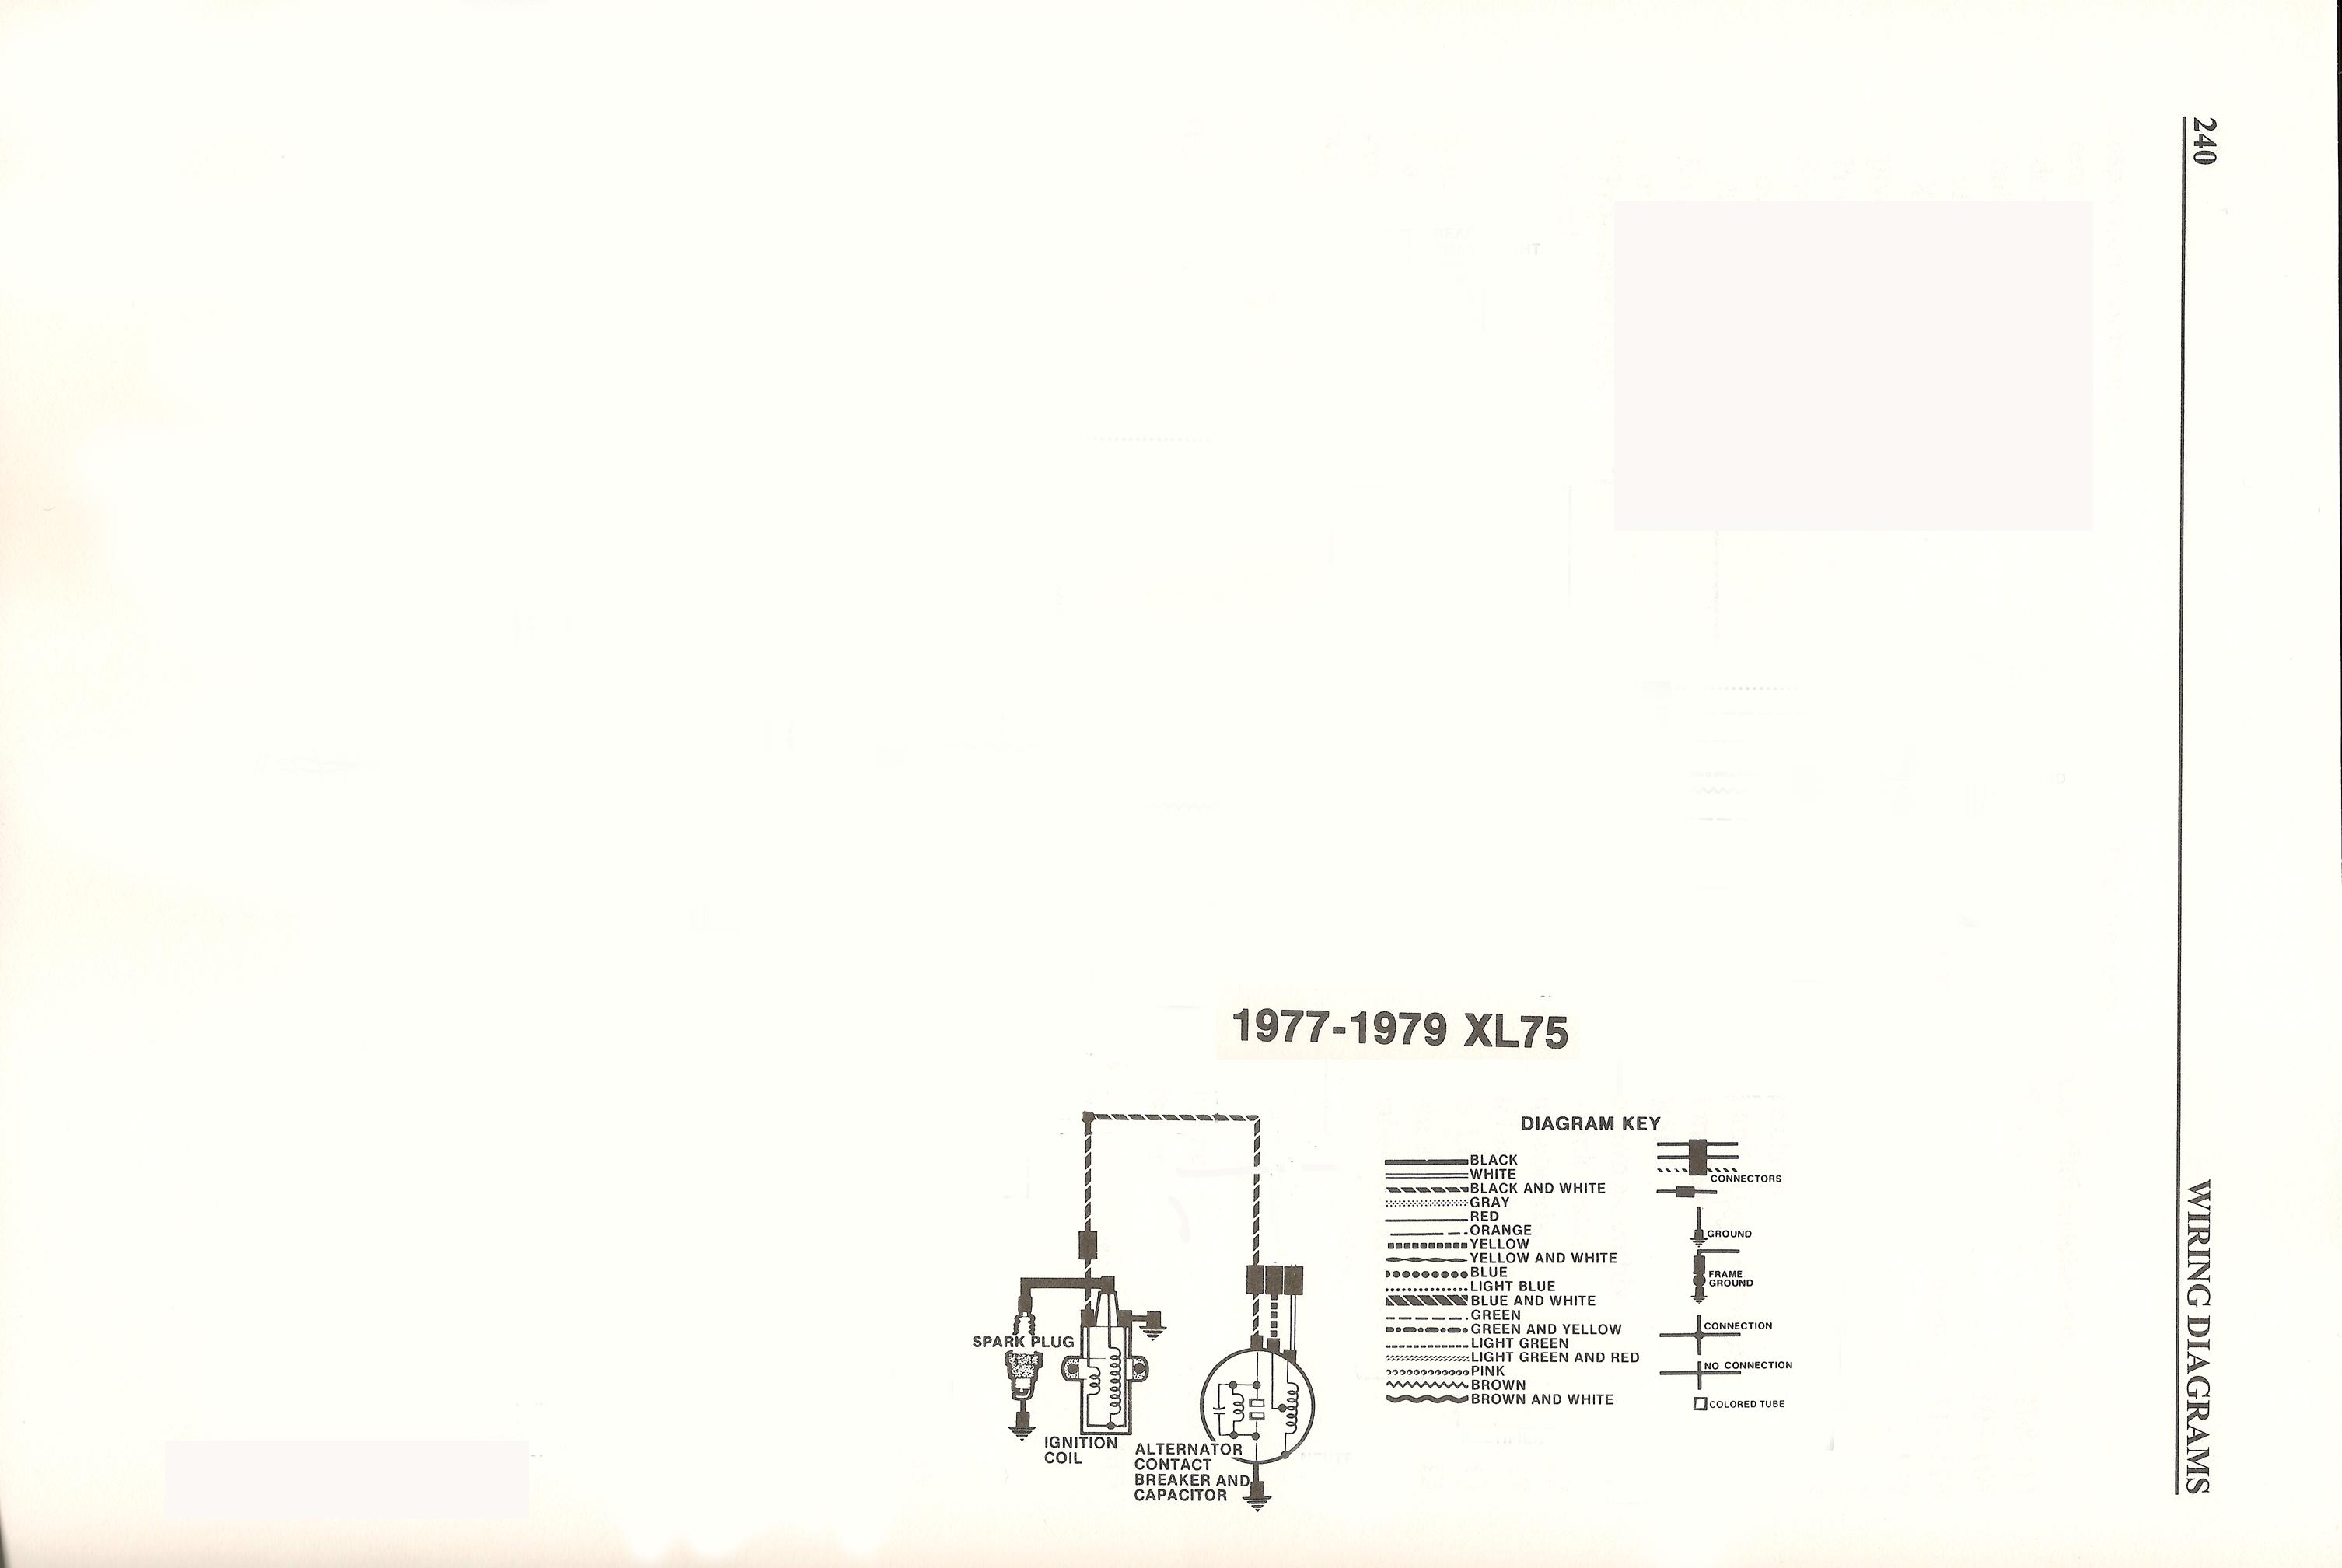 1977 honda xl75 stator page 2 name 1977 79 xl75 wiring schematic 1 swarovskicordoba Choice Image